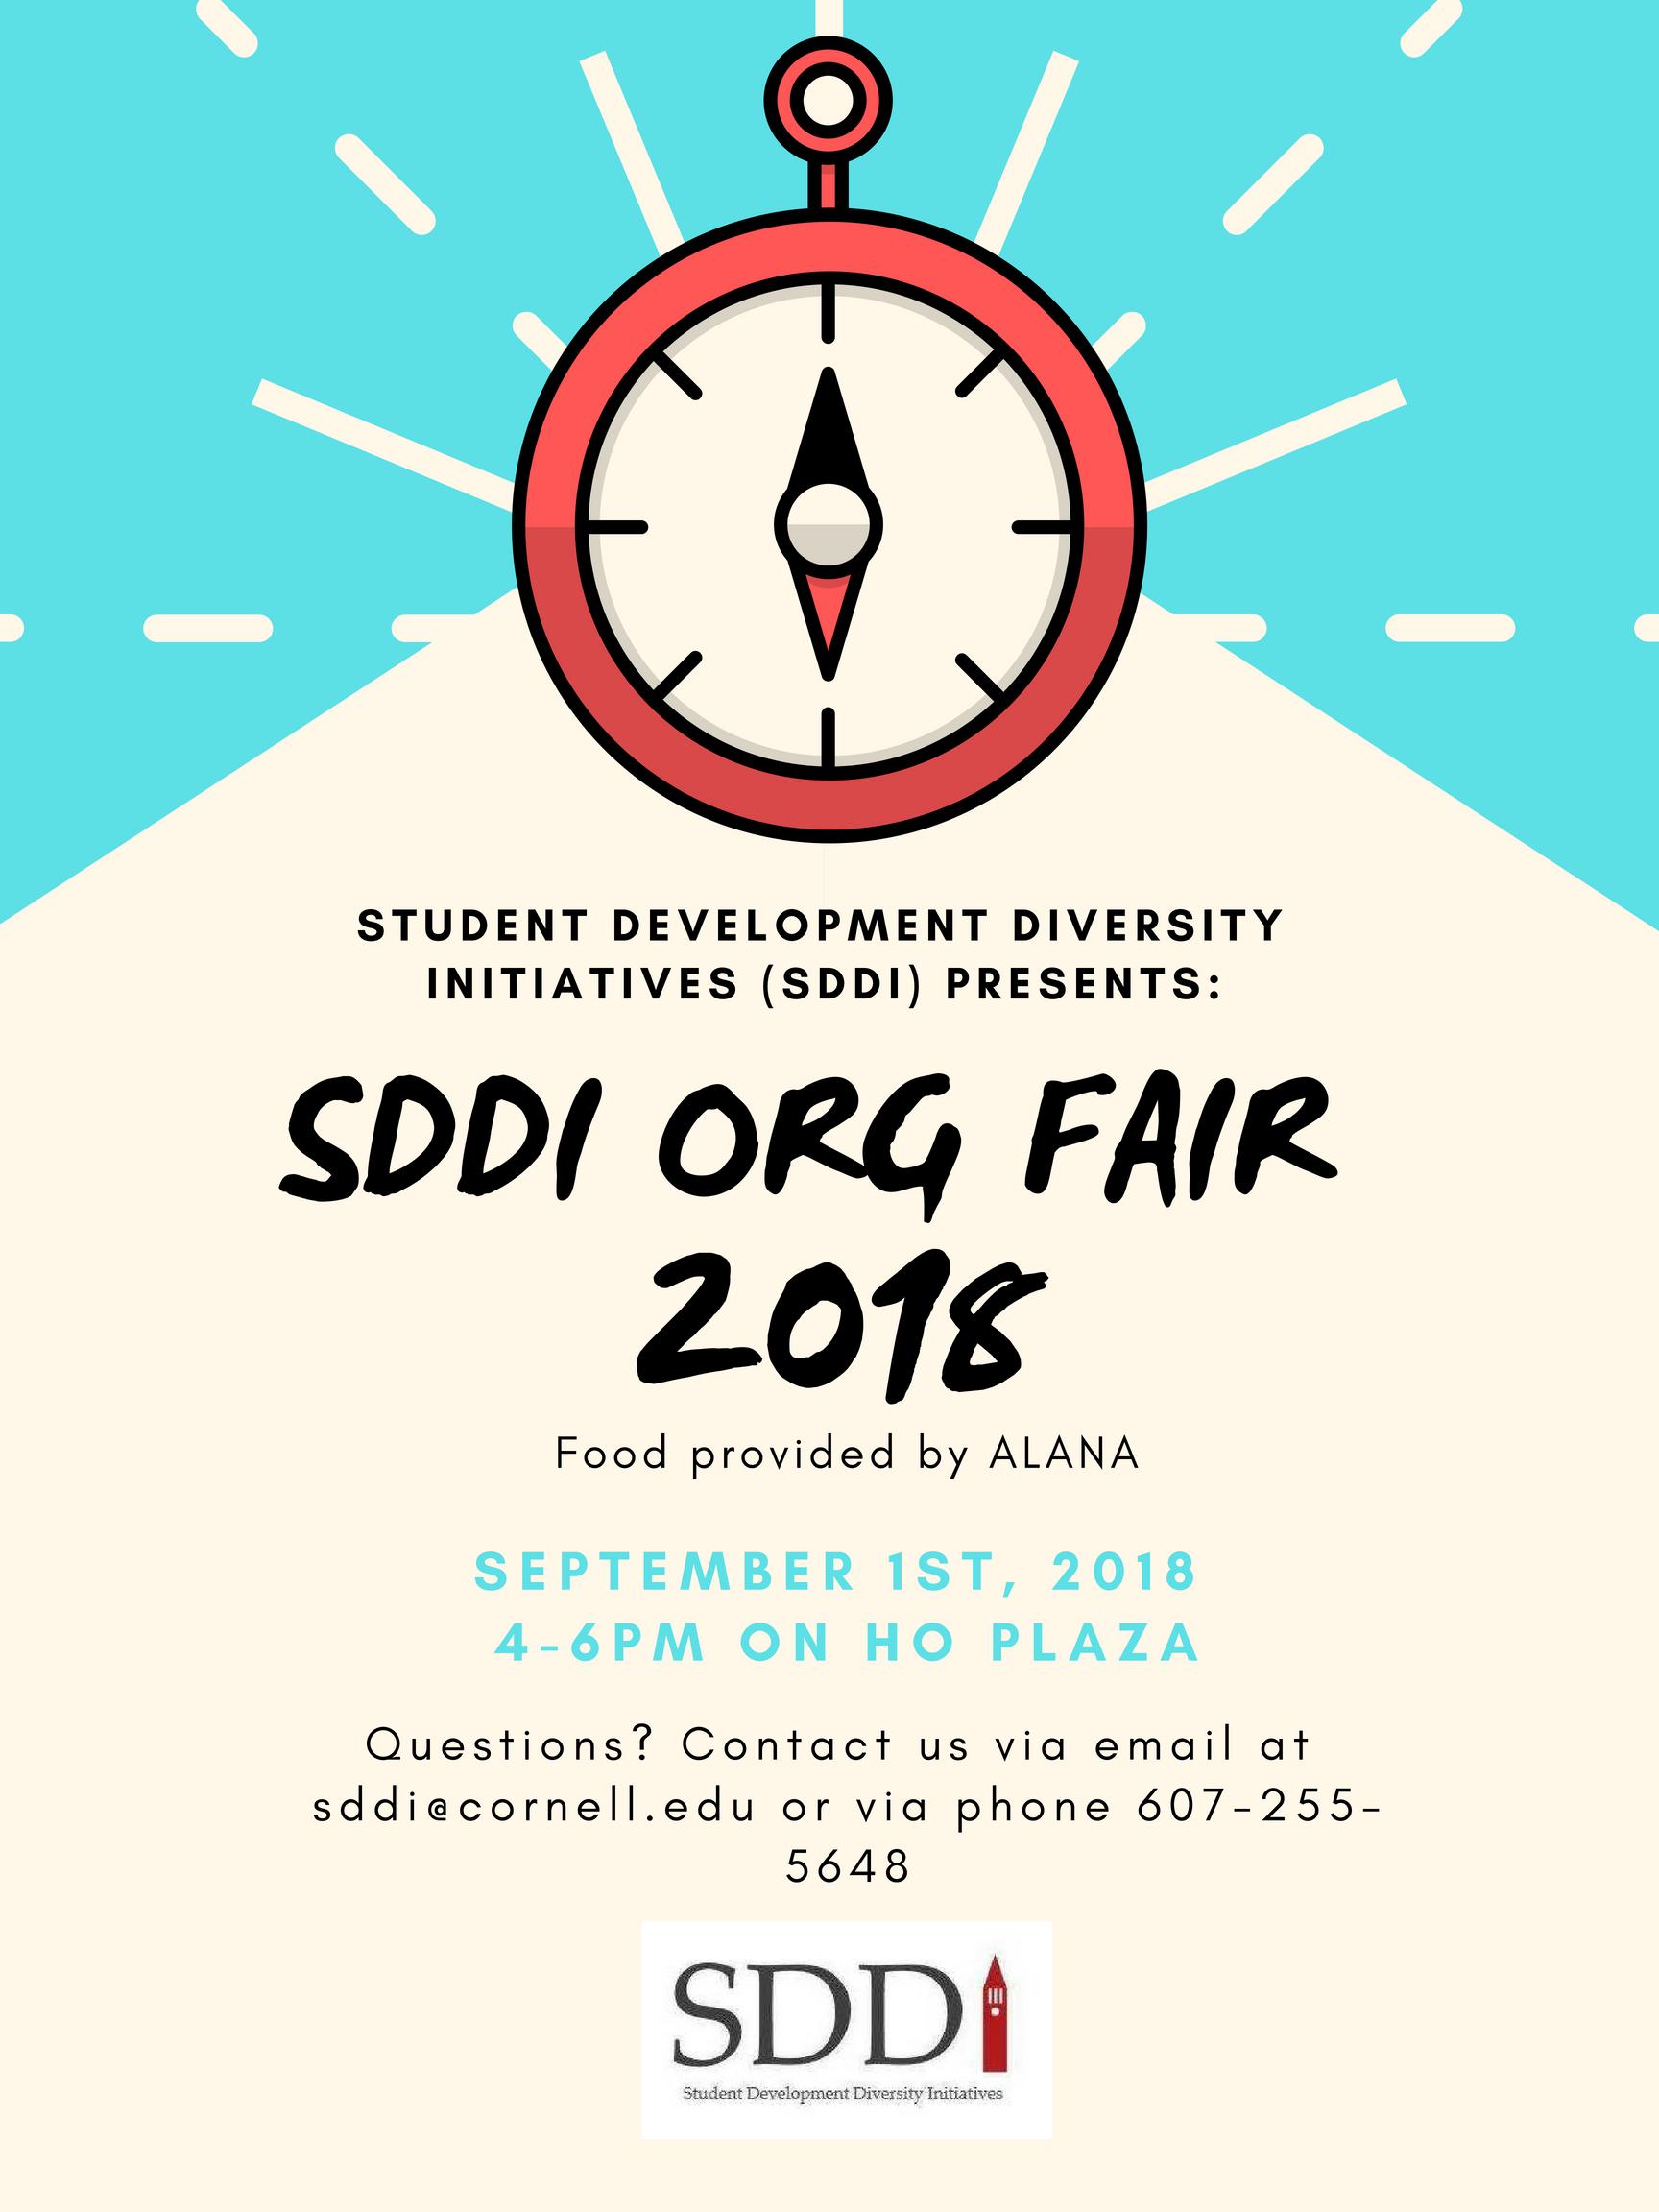 SDDI Student Organization Fair